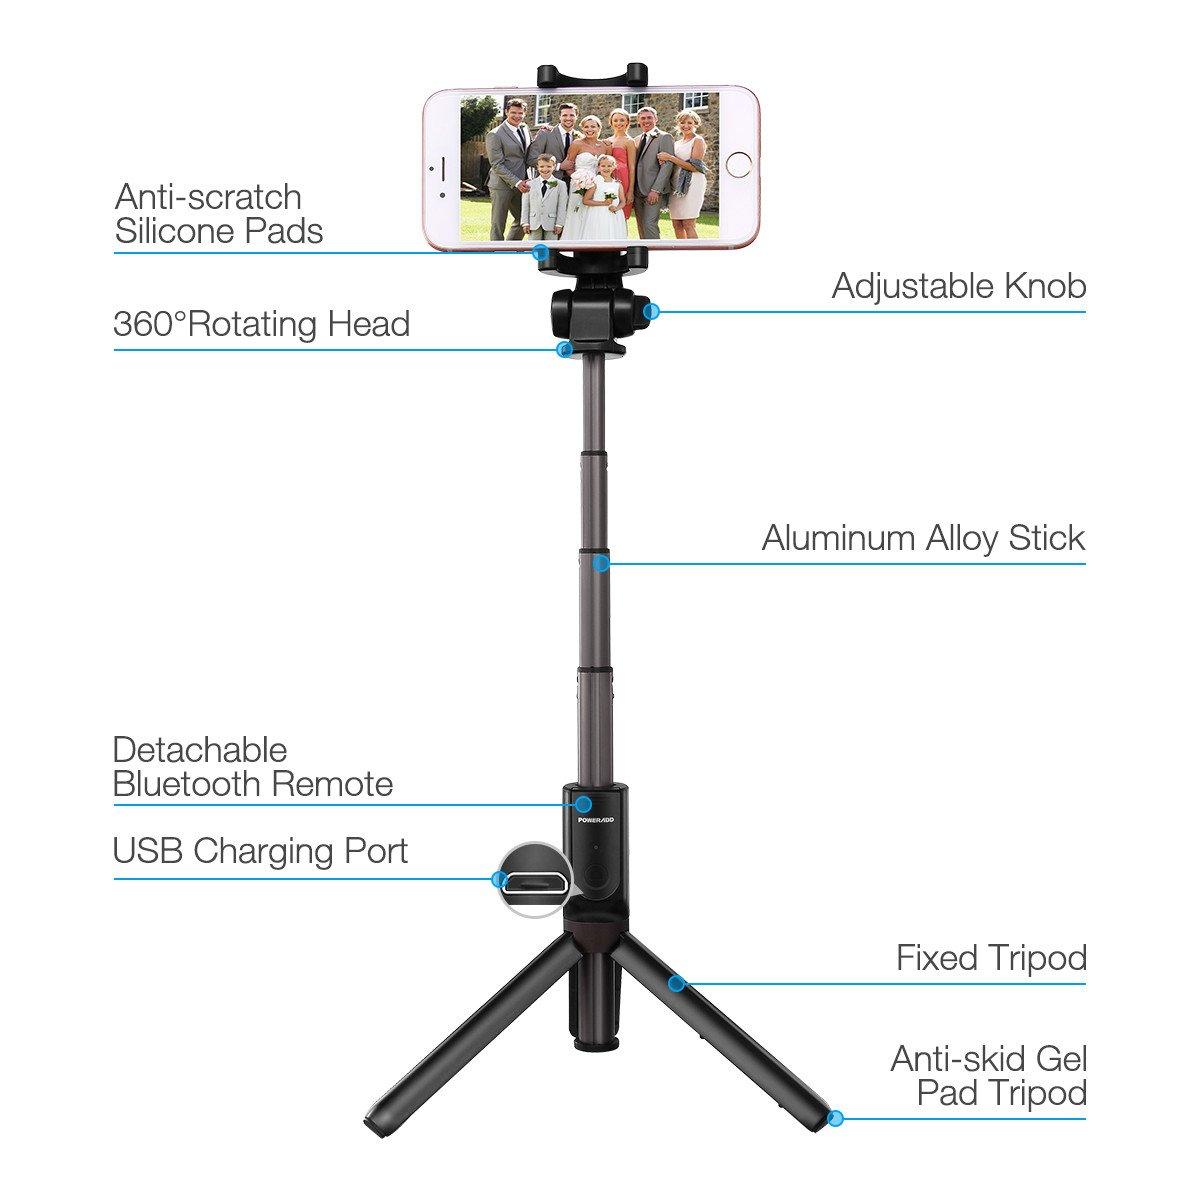 Selfie Stick Tripod,Poweradd Extendable Selfie Stick with Wireless/Detachable Remote Shutter for iPhone X /iPhone 8 /8 Plus/iPhone 7/iPhone 7 Plus/Galaxy Note 8/S8 /S8 Plus/Google More-Black